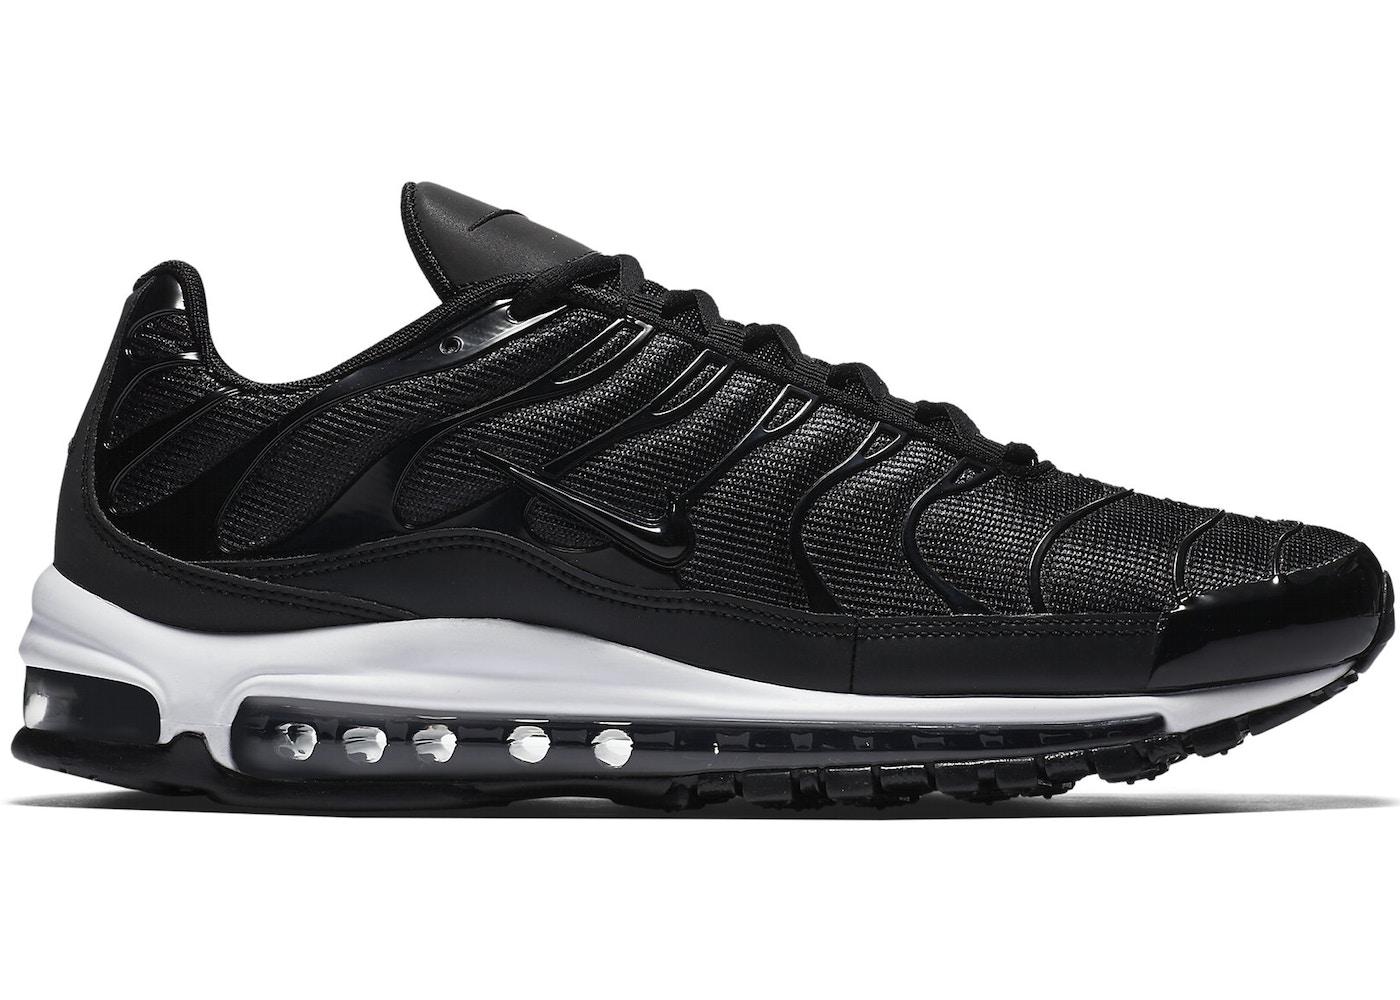 Nike Air Max 97 Plus Black White